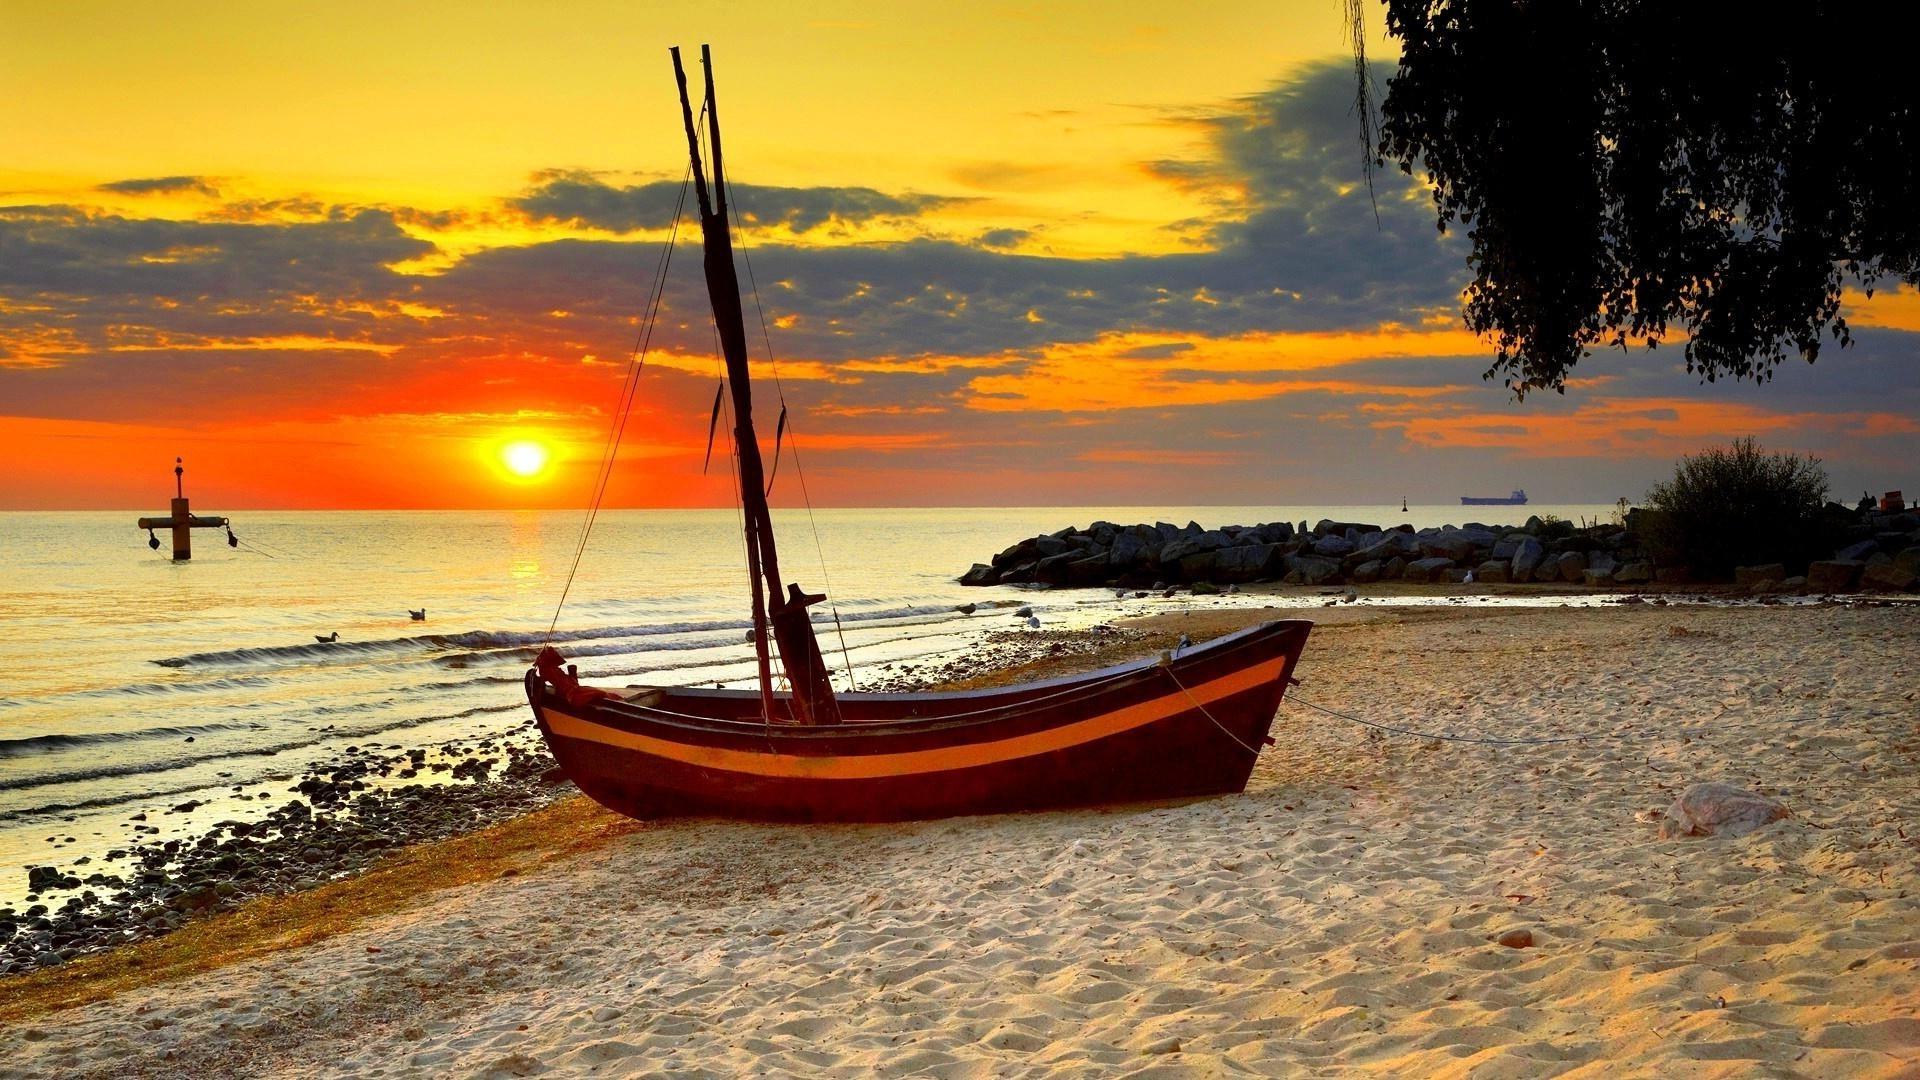 Wallpaper : sunlight, boat, sunset, sea, bay, nature ...